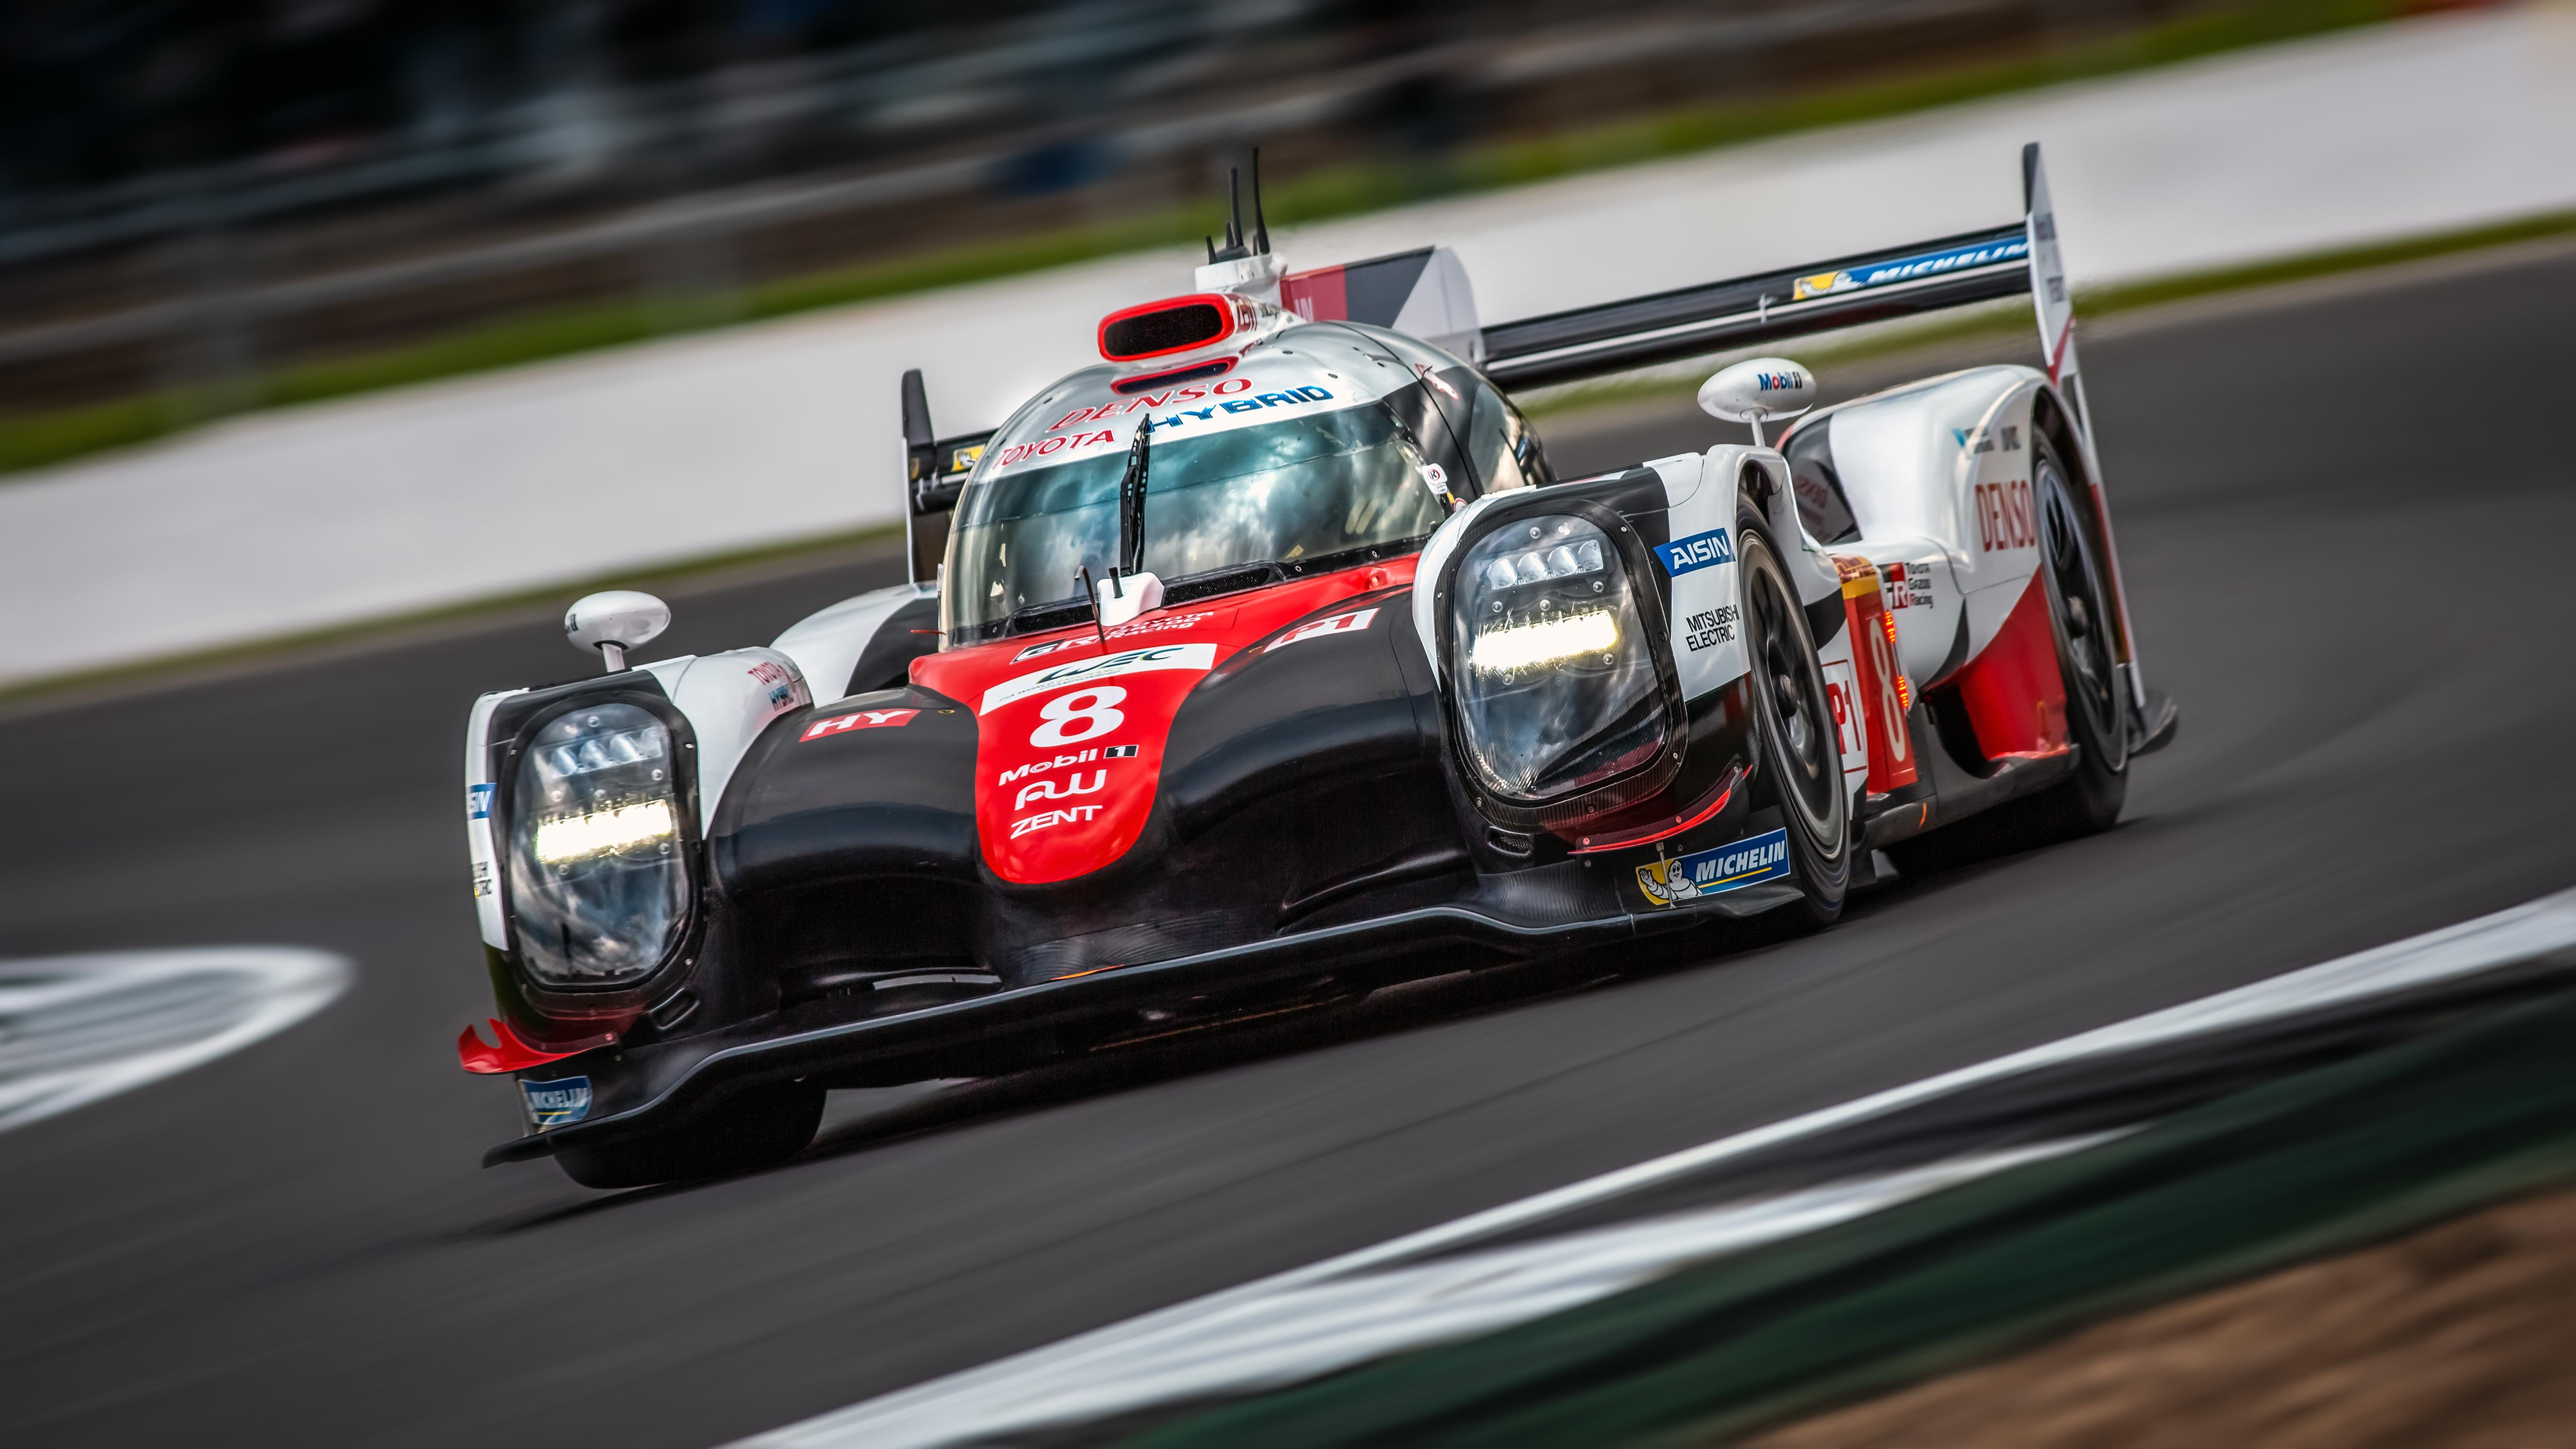 Toyota Gazoo Racing Wec , HD Wallpaper & Backgrounds